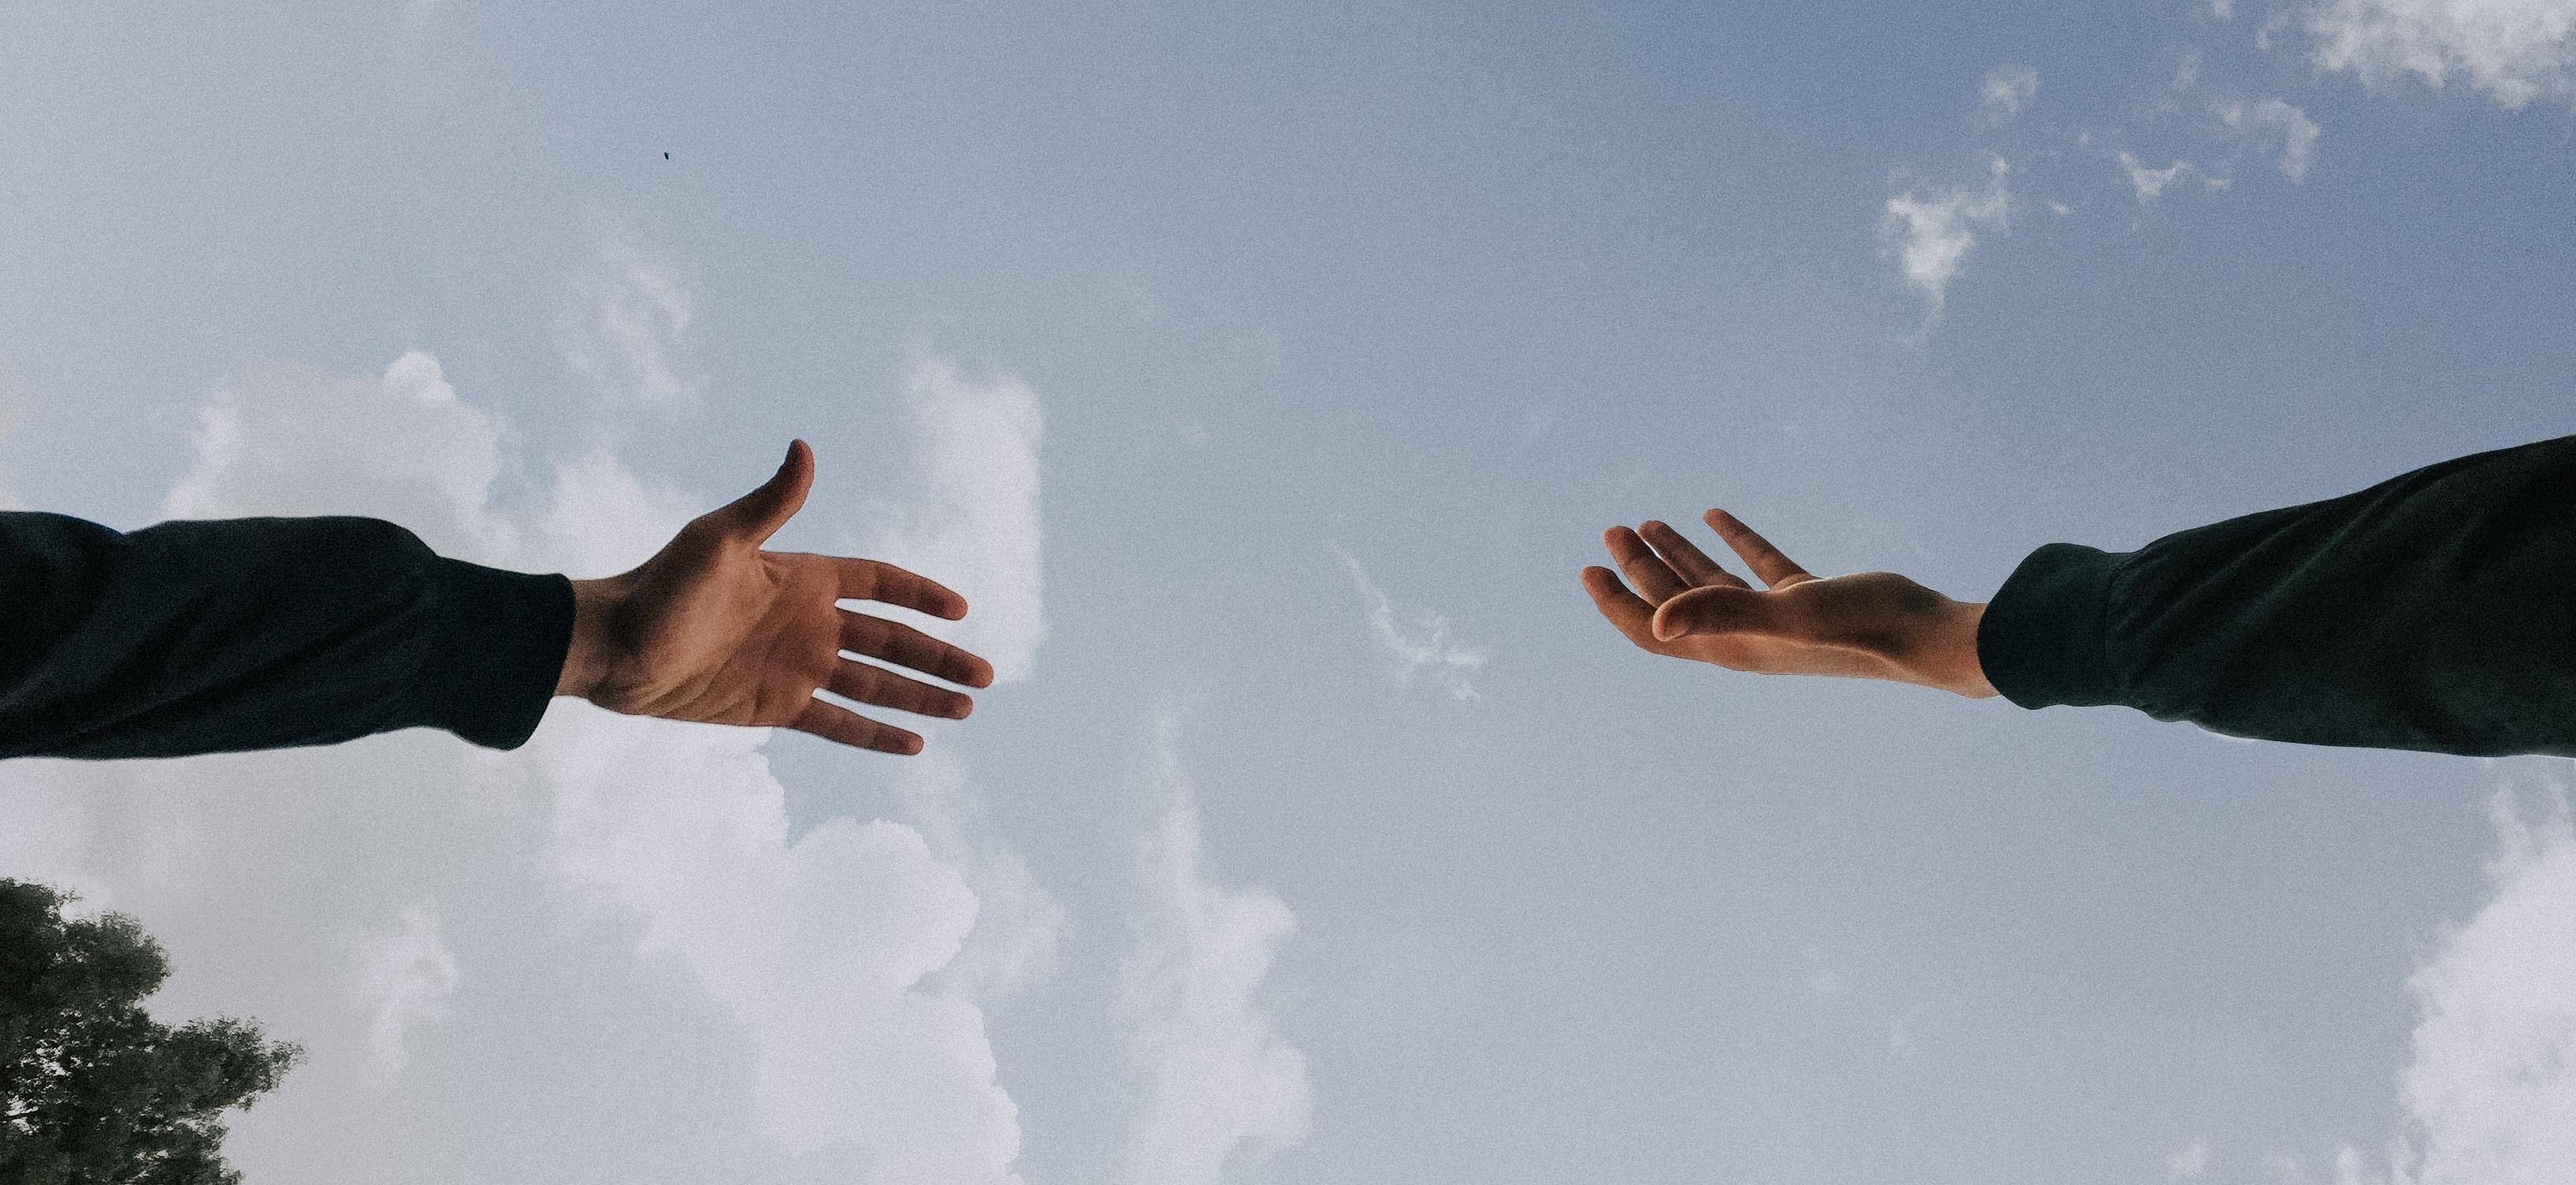 Mental health awareness week - kindness matters